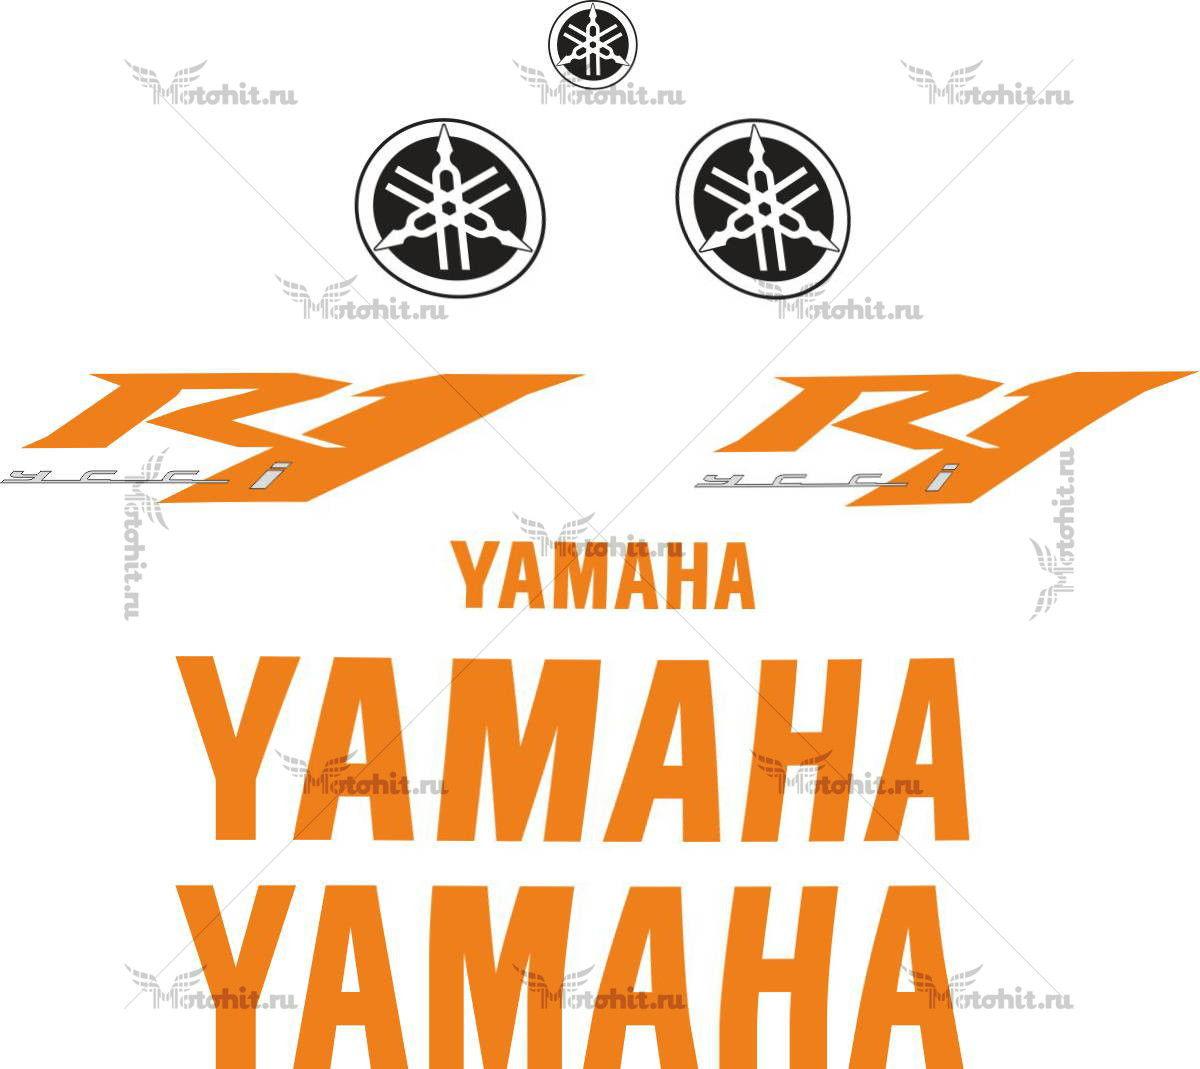 Комплект наклеек Yamaha YZF-R1 2009 TXT